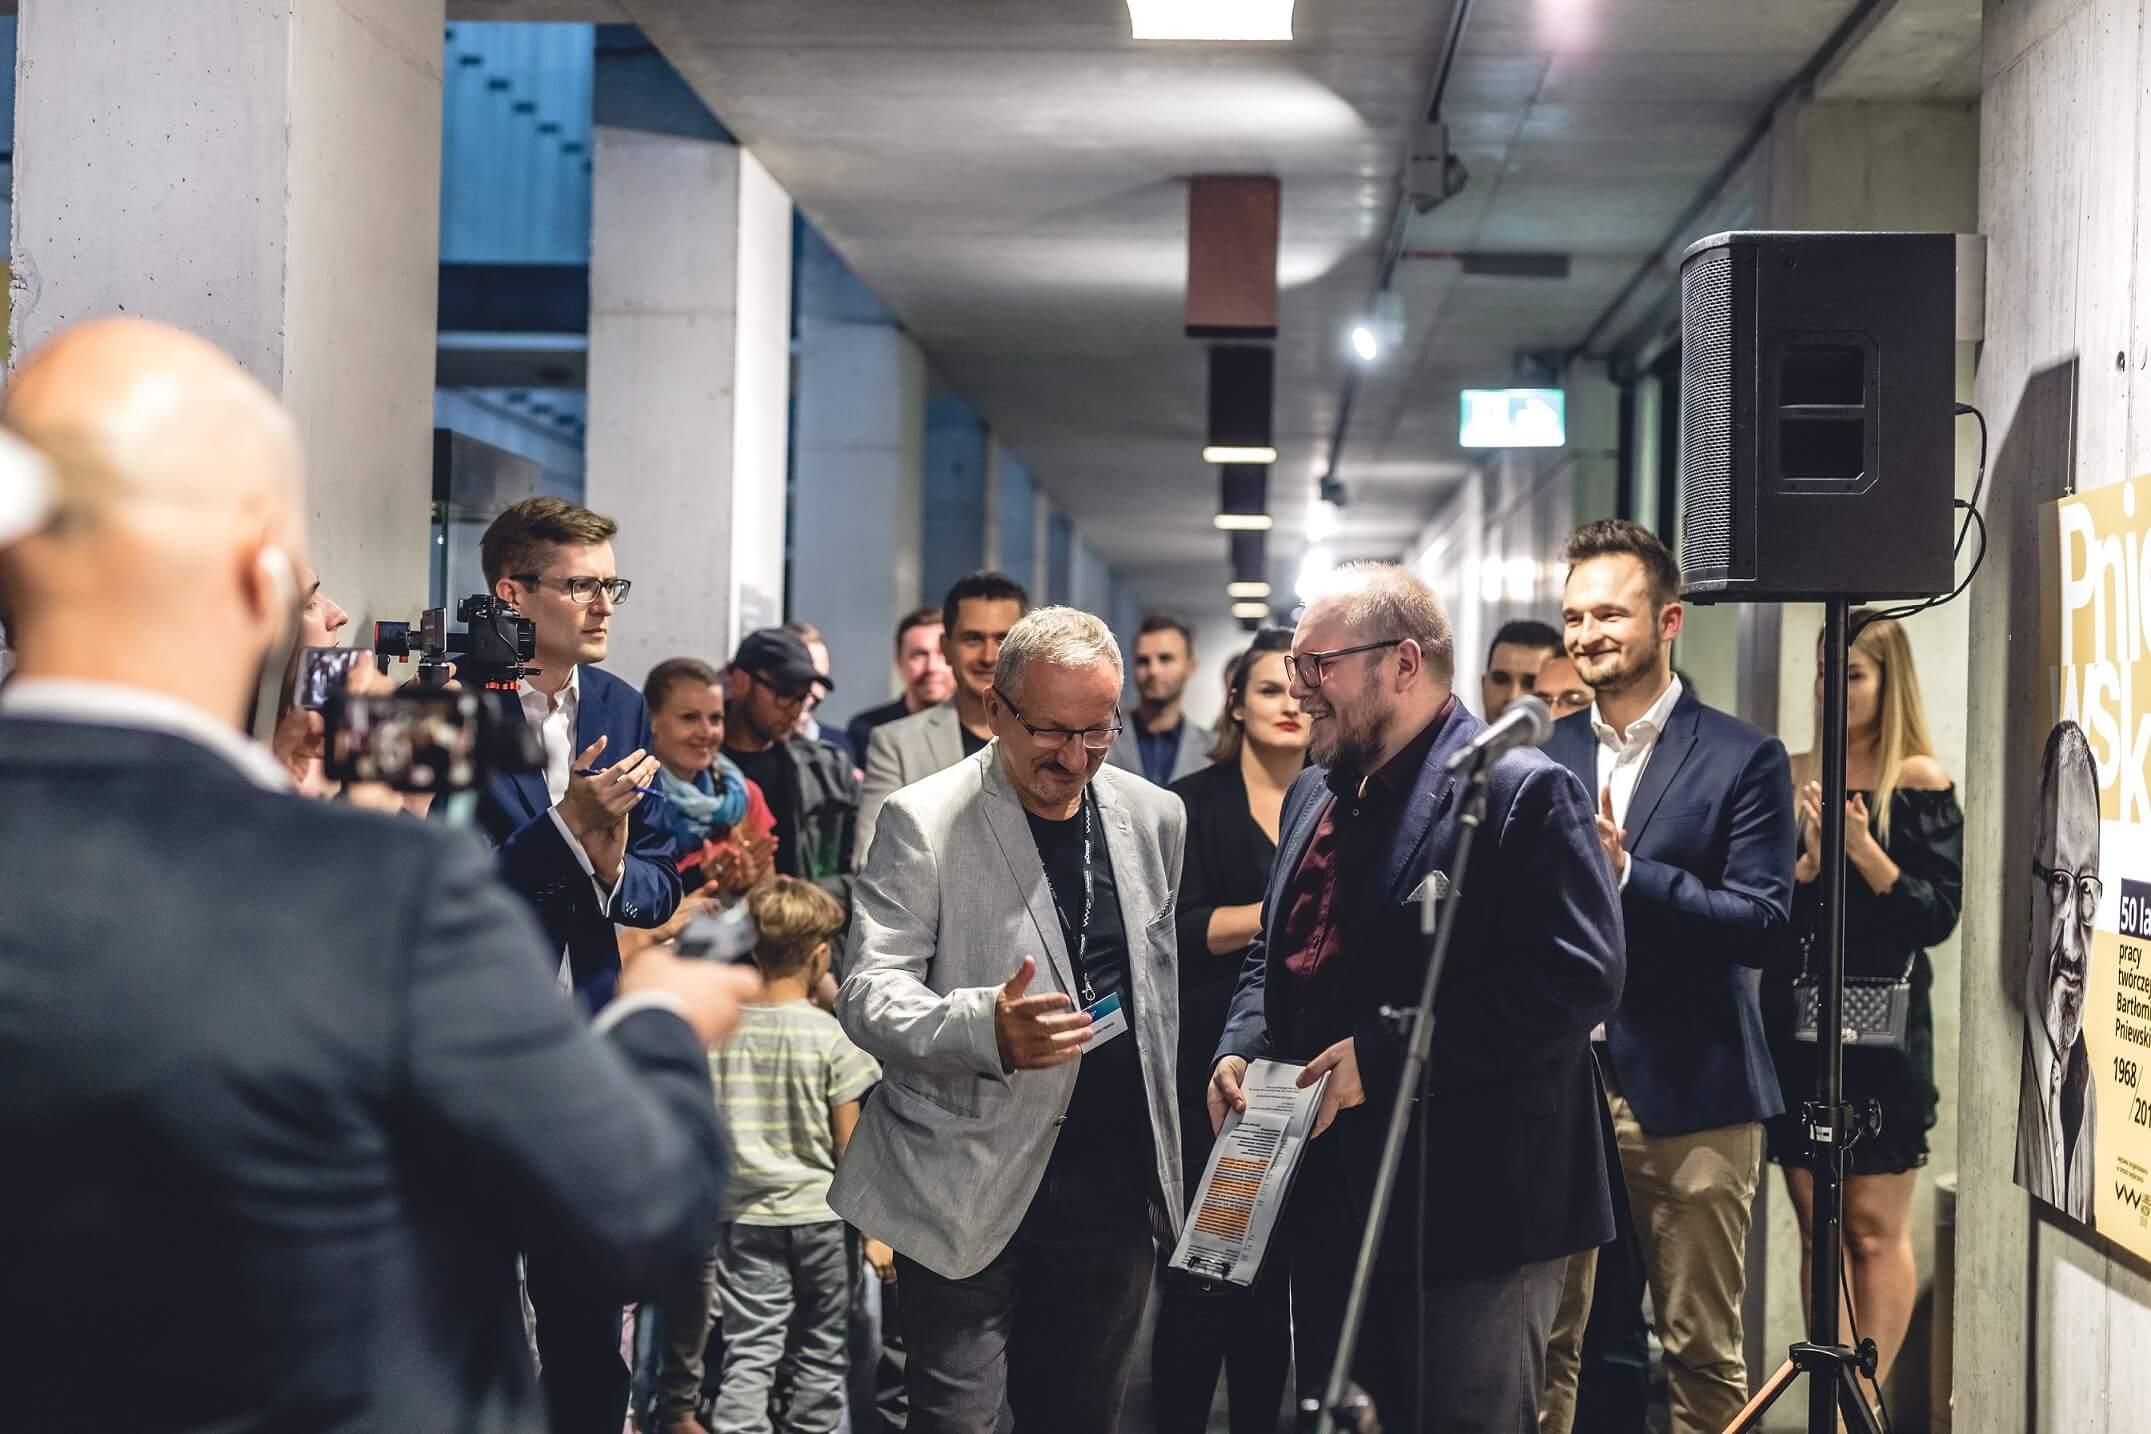 Drukarnia-Petit-Lubelski-Wzór-2018